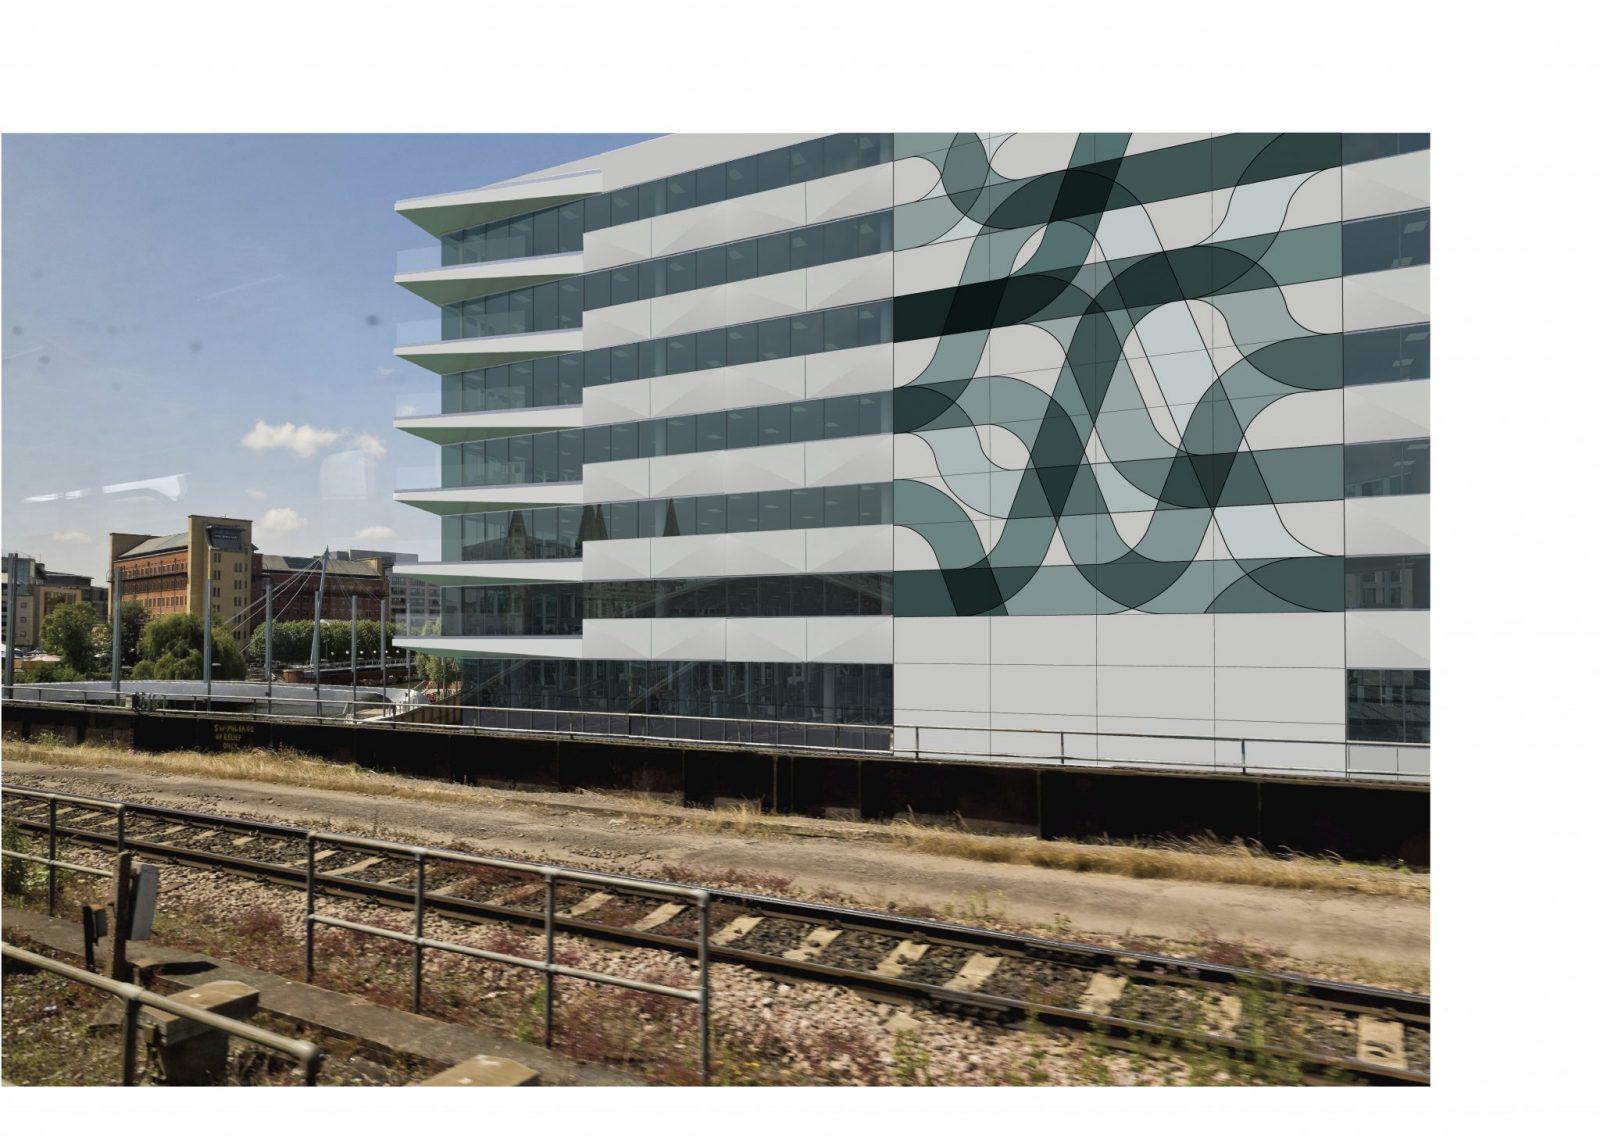 3 Glass Wharf, Bristol - Public Artwork installation by Terry Haggerty